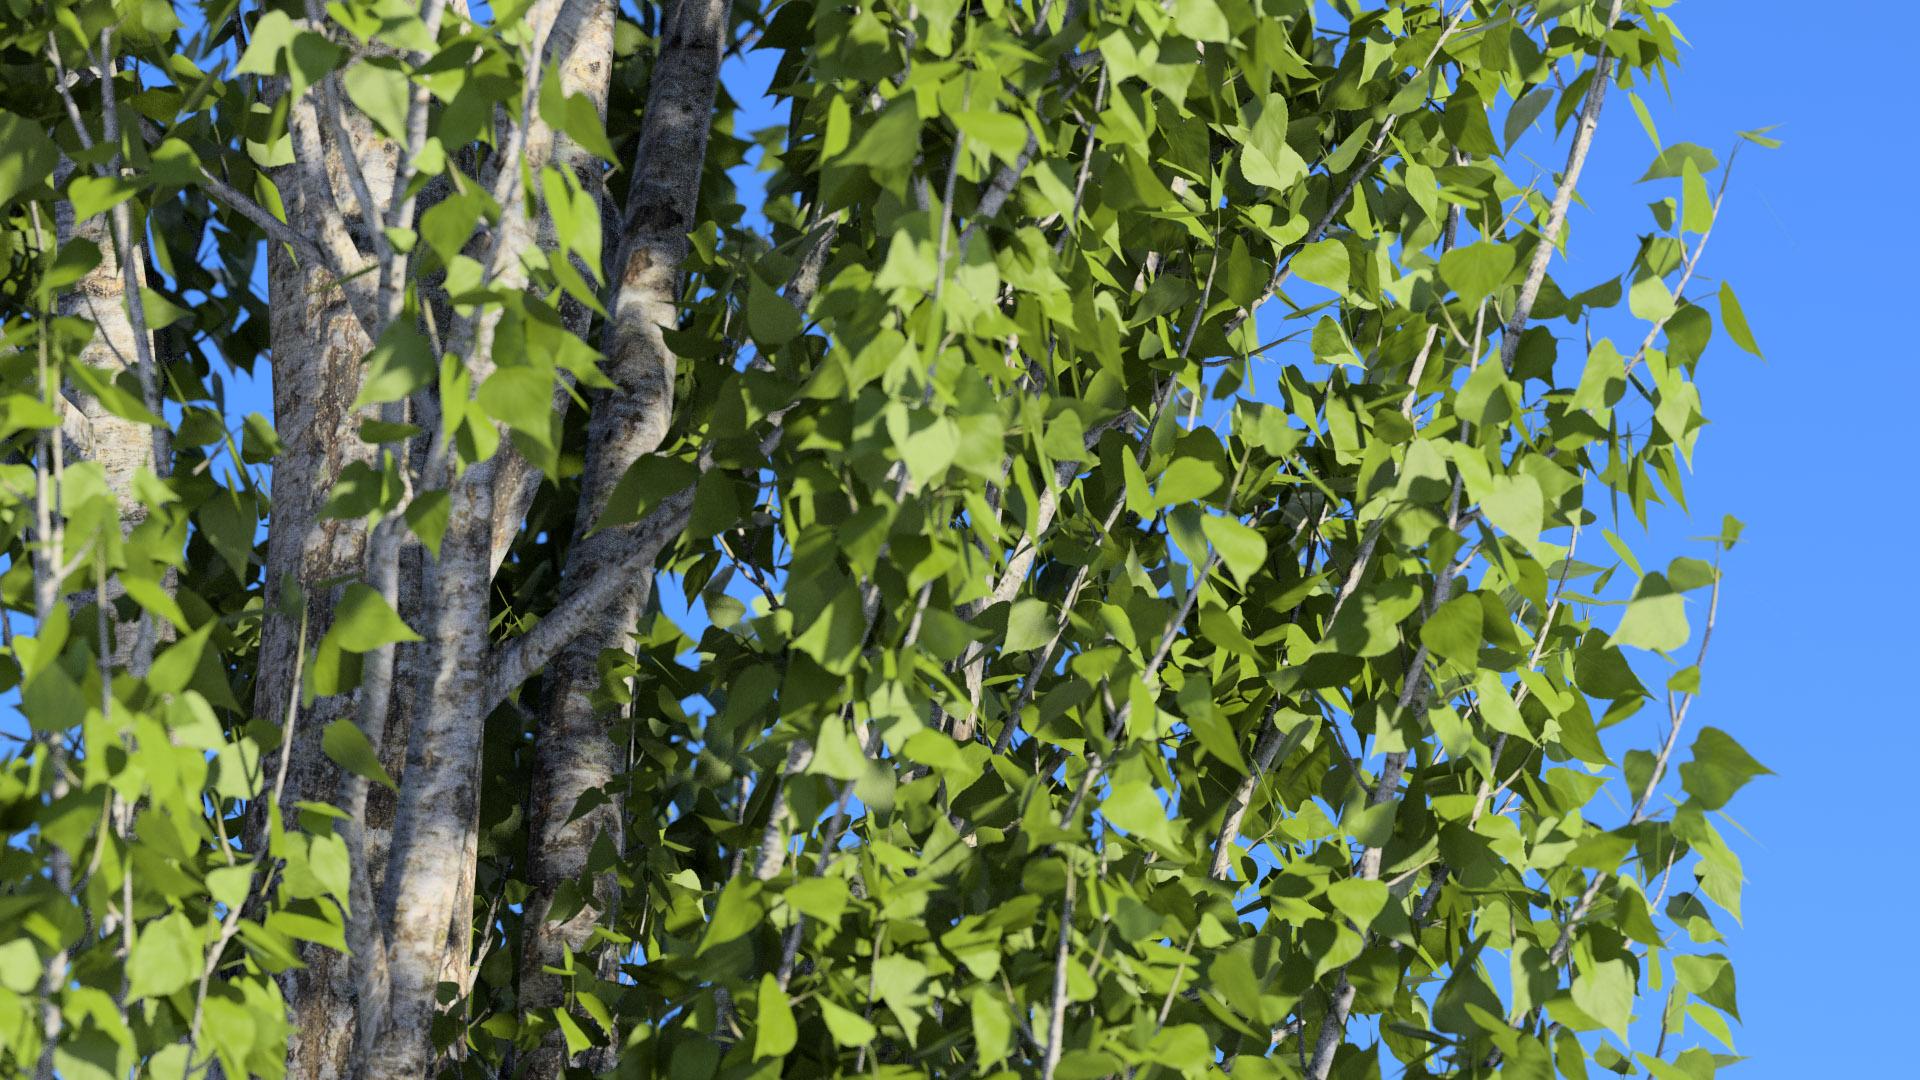 3D model of the Lombardy poplar Populus nigra